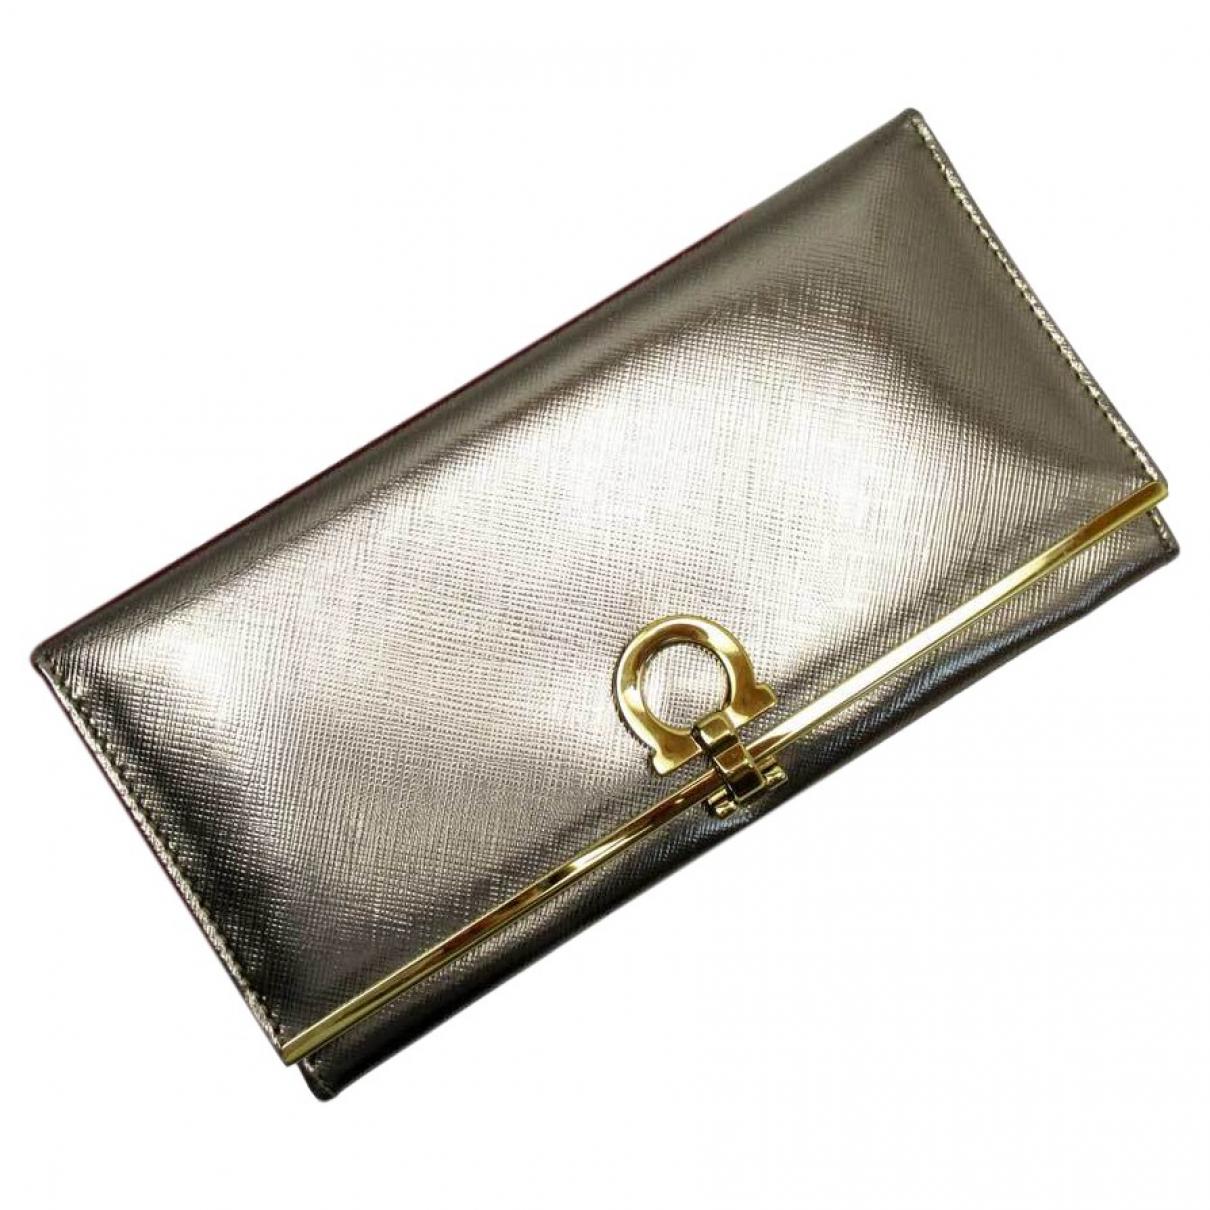 Salvatore Ferragamo \N Brown Leather wallet for Women \N